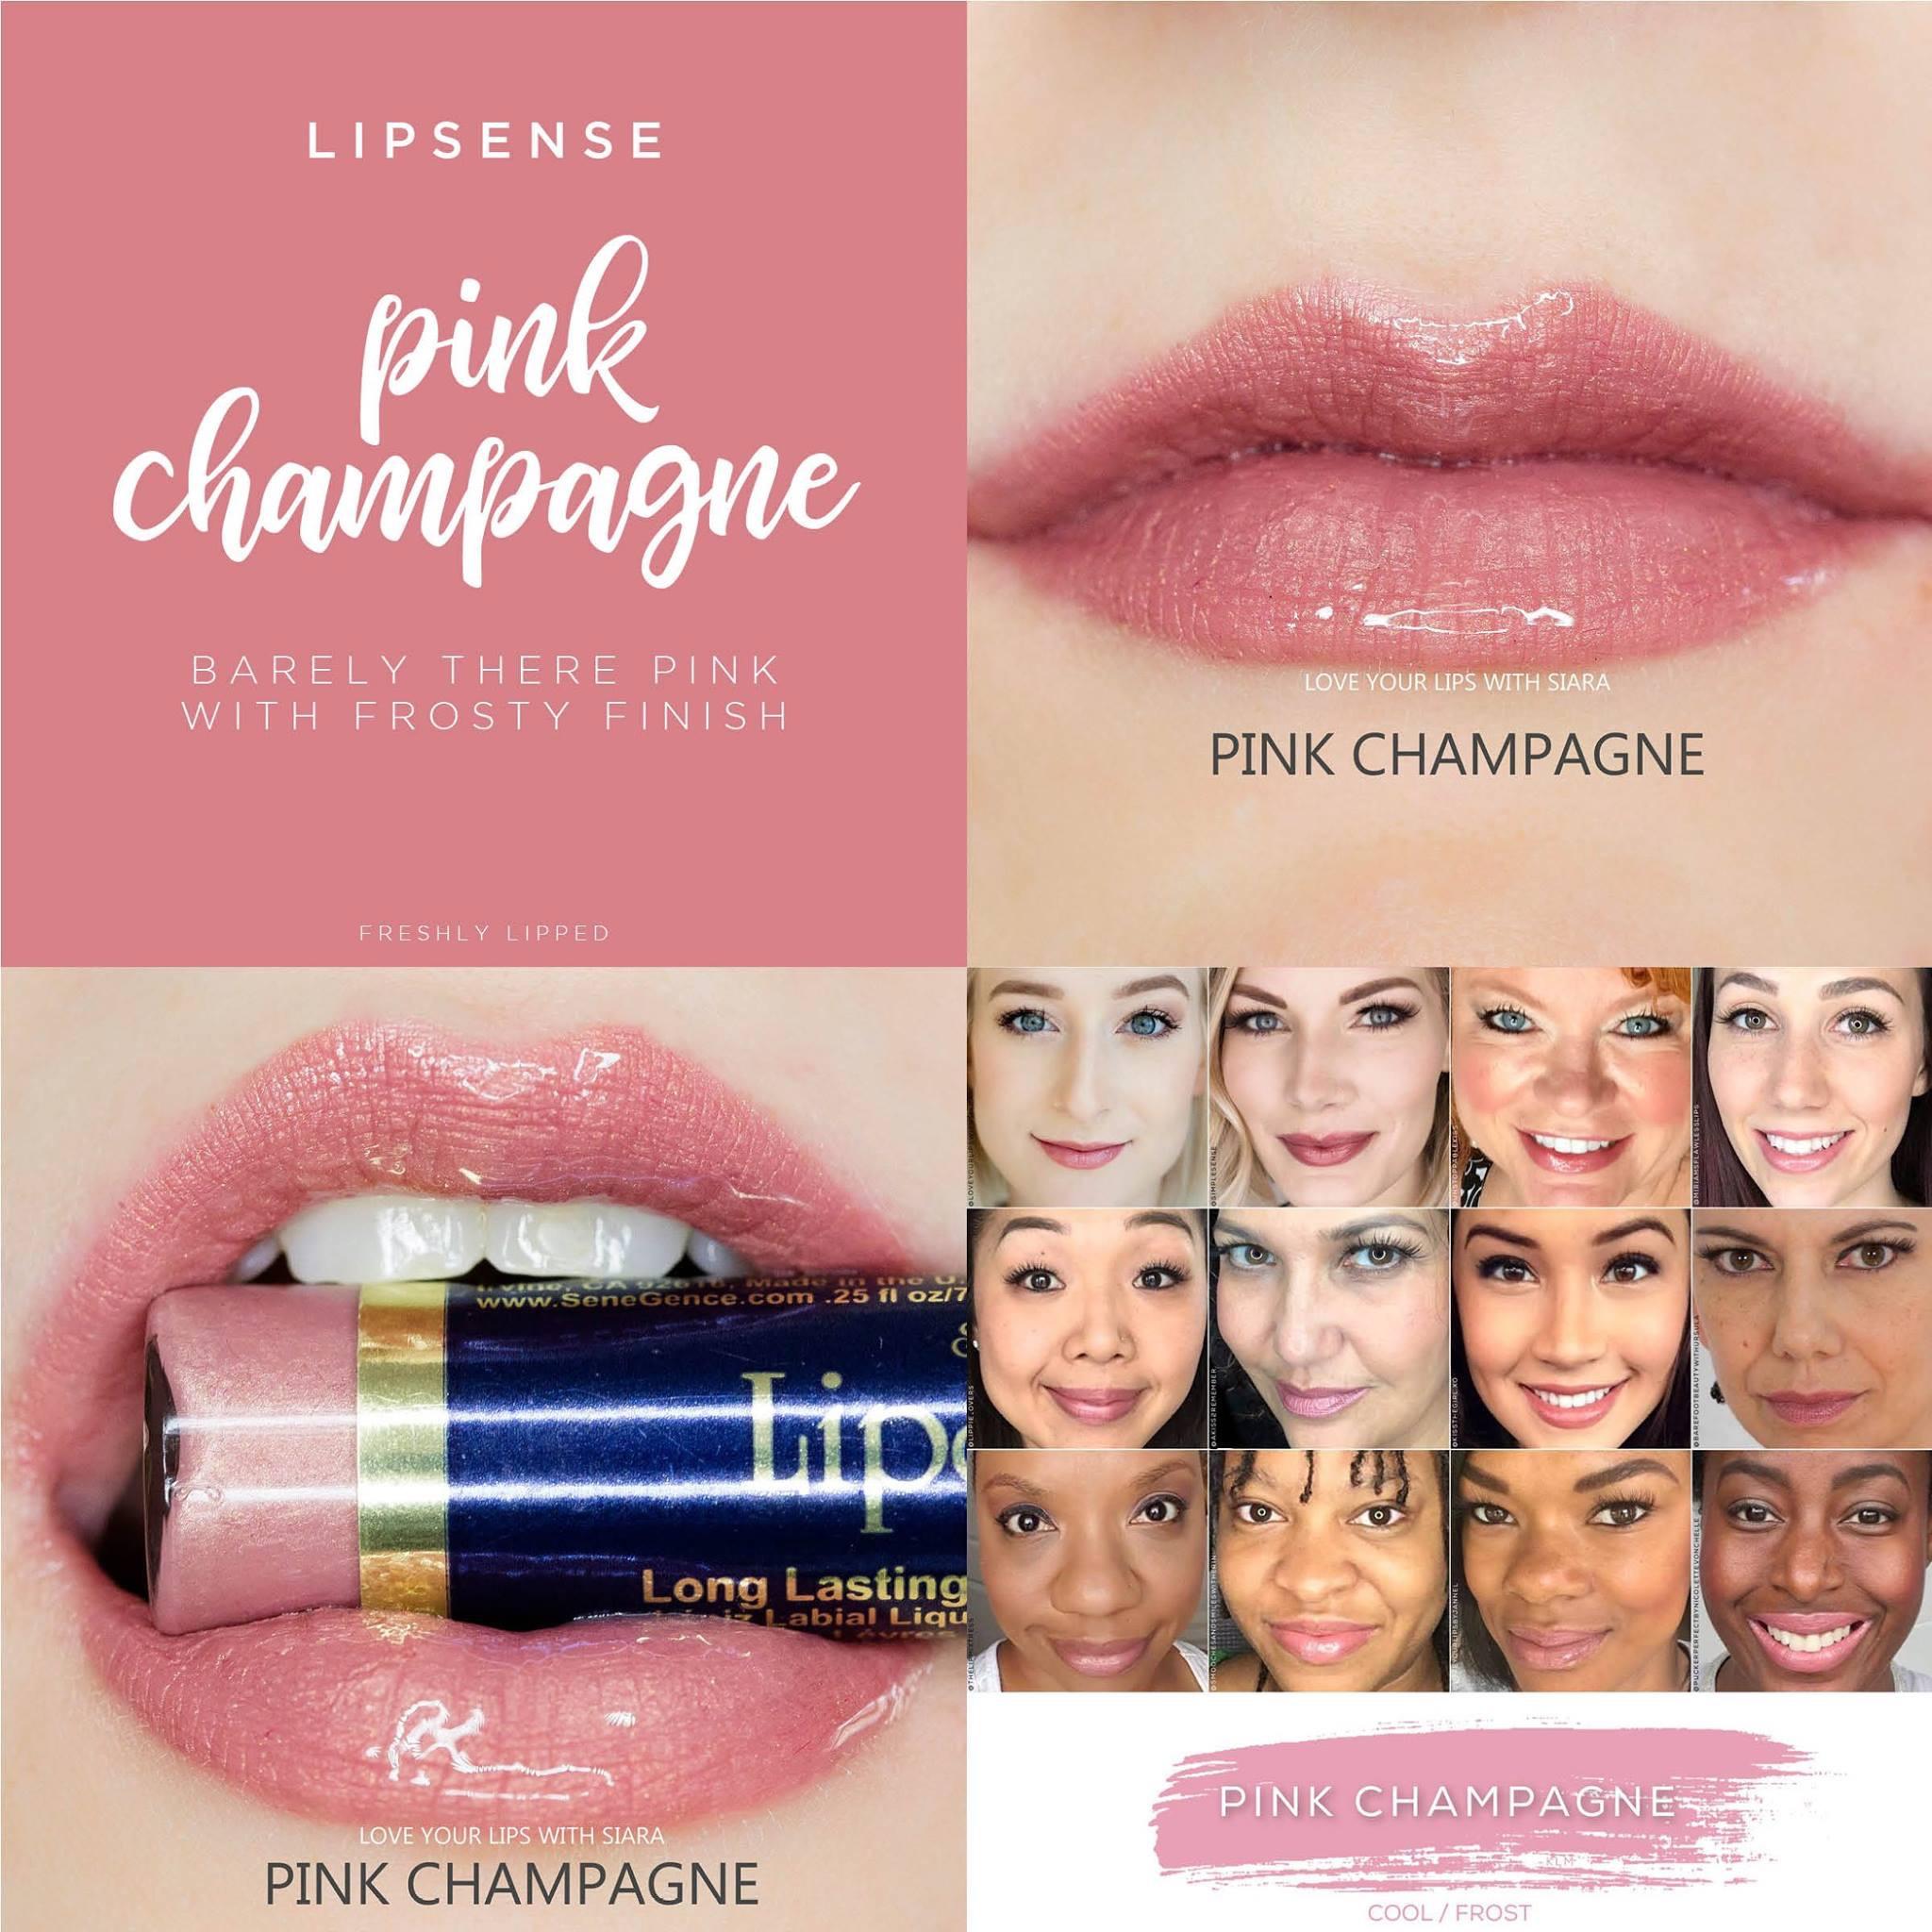 Pink Champagne LipSense Collage